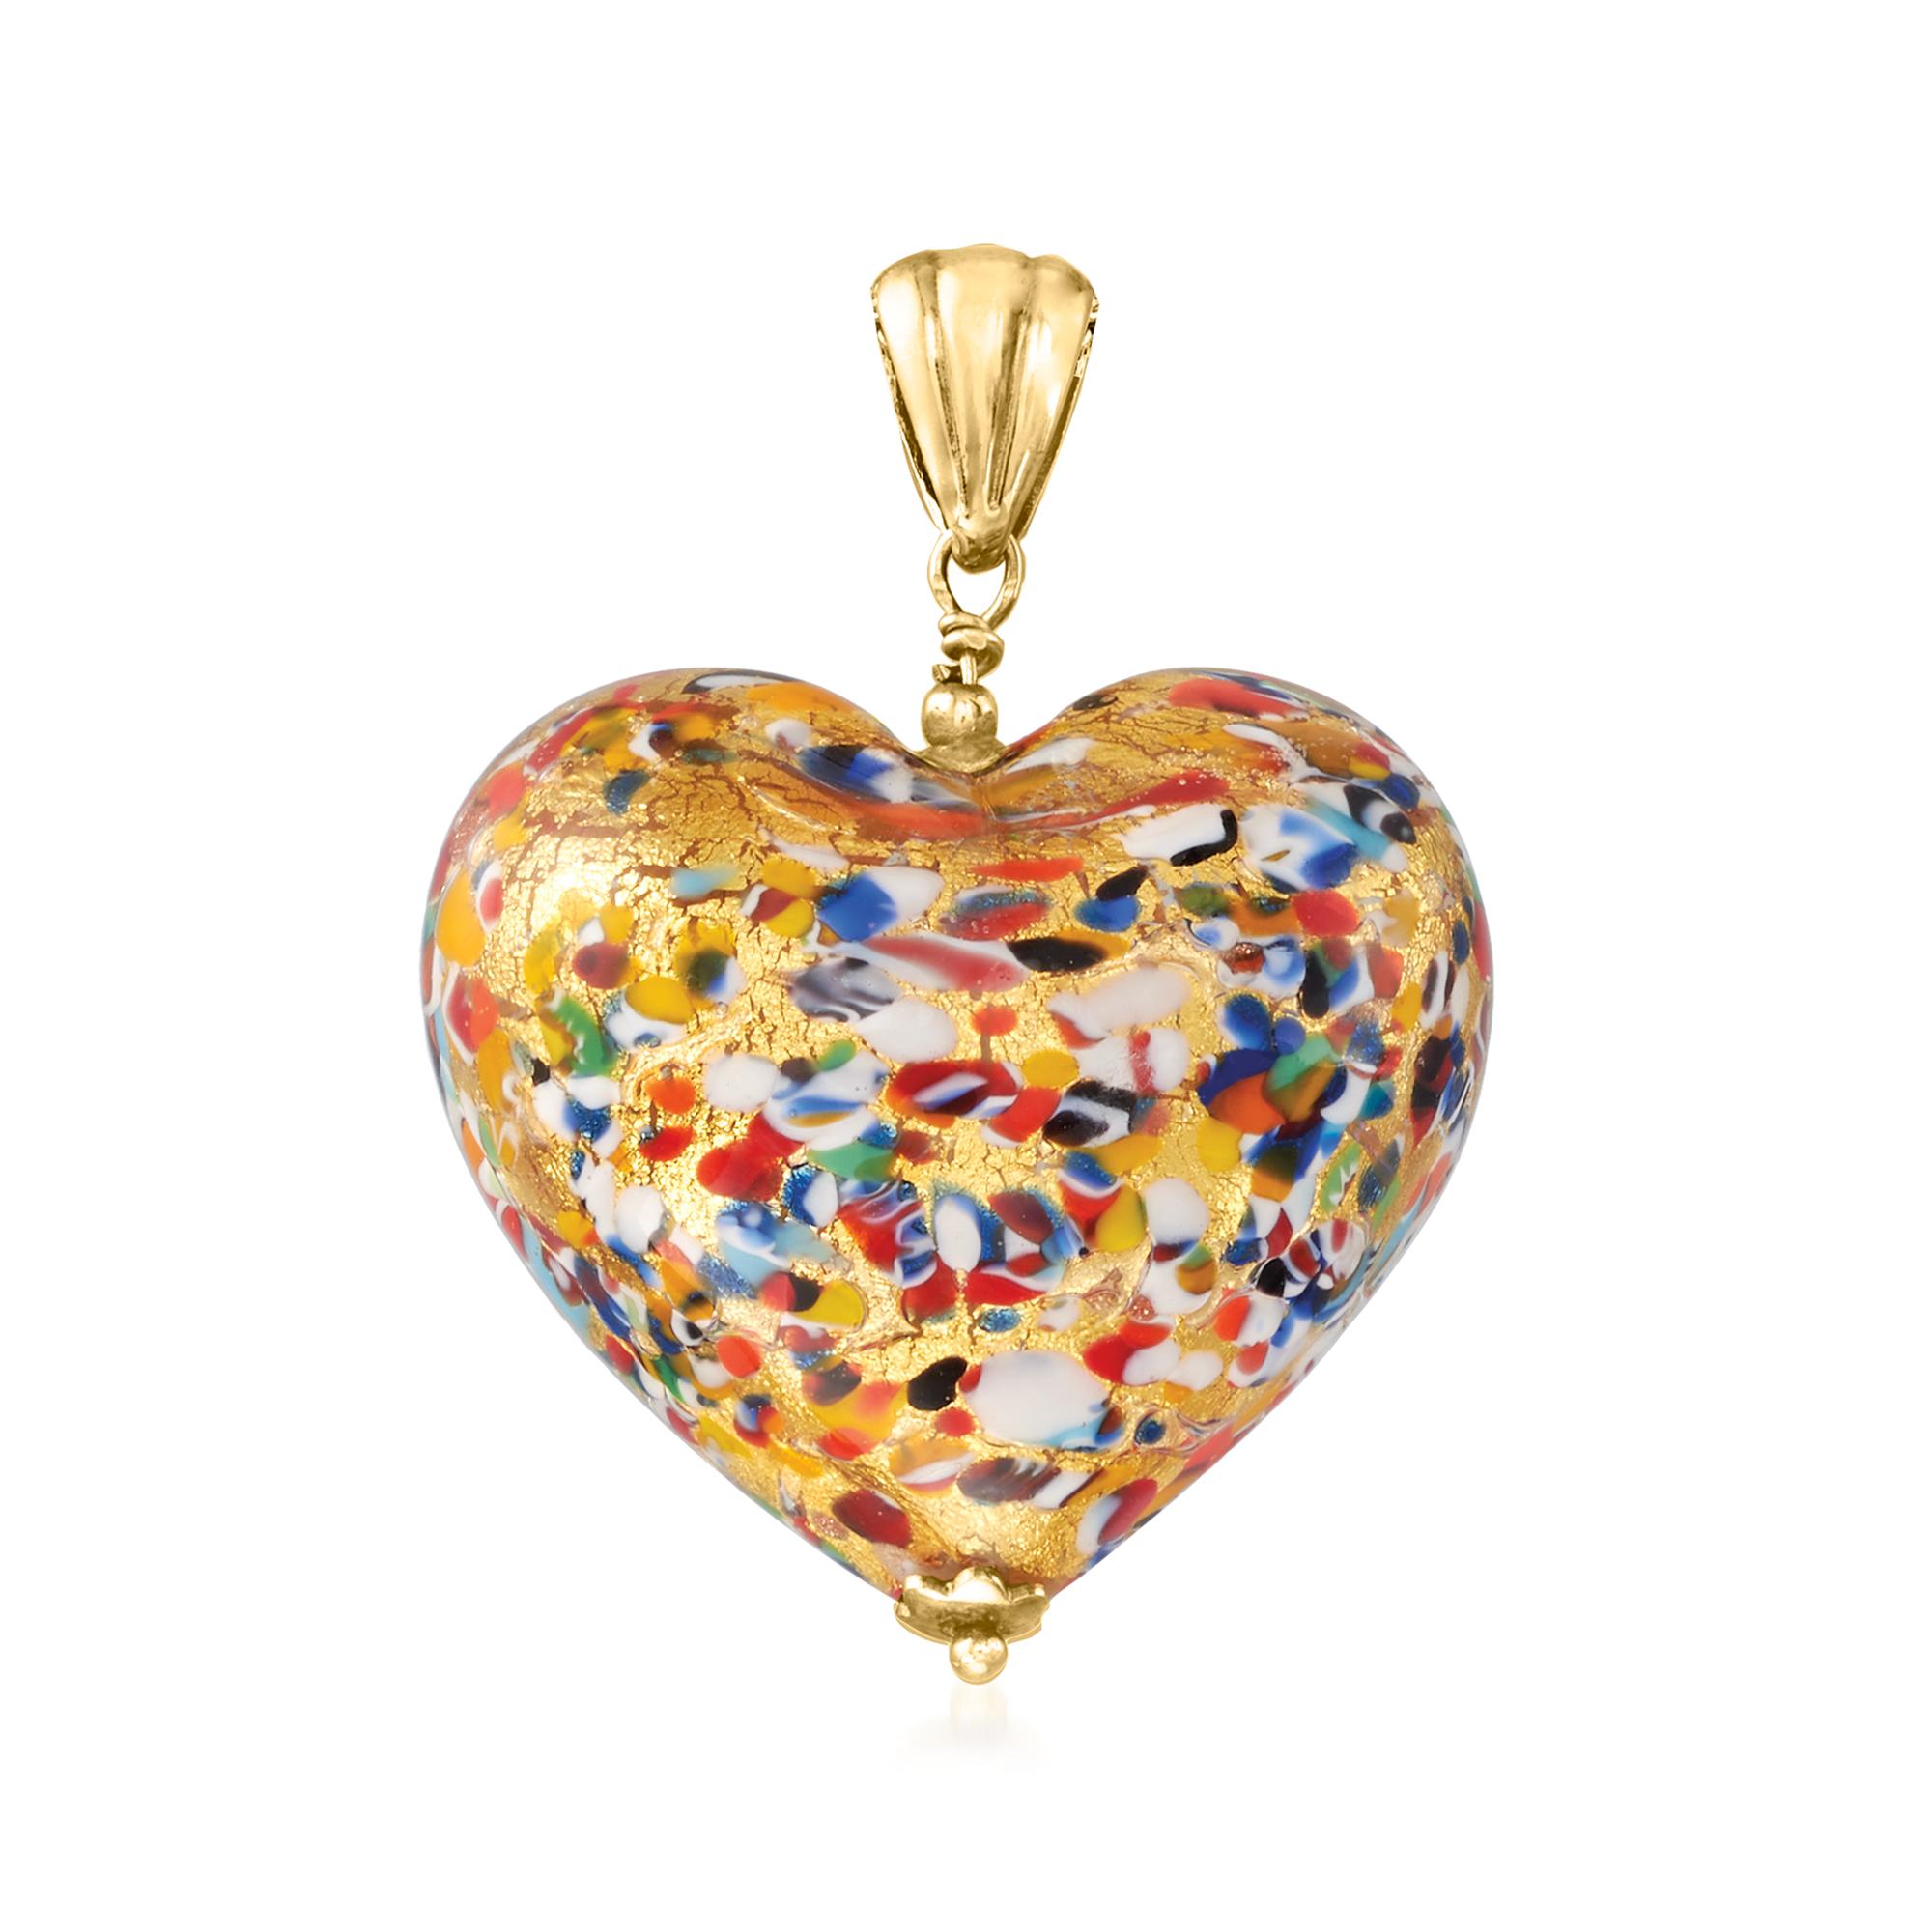 Striped Gold GlassOfVenice Murano Glass Heart Pendant